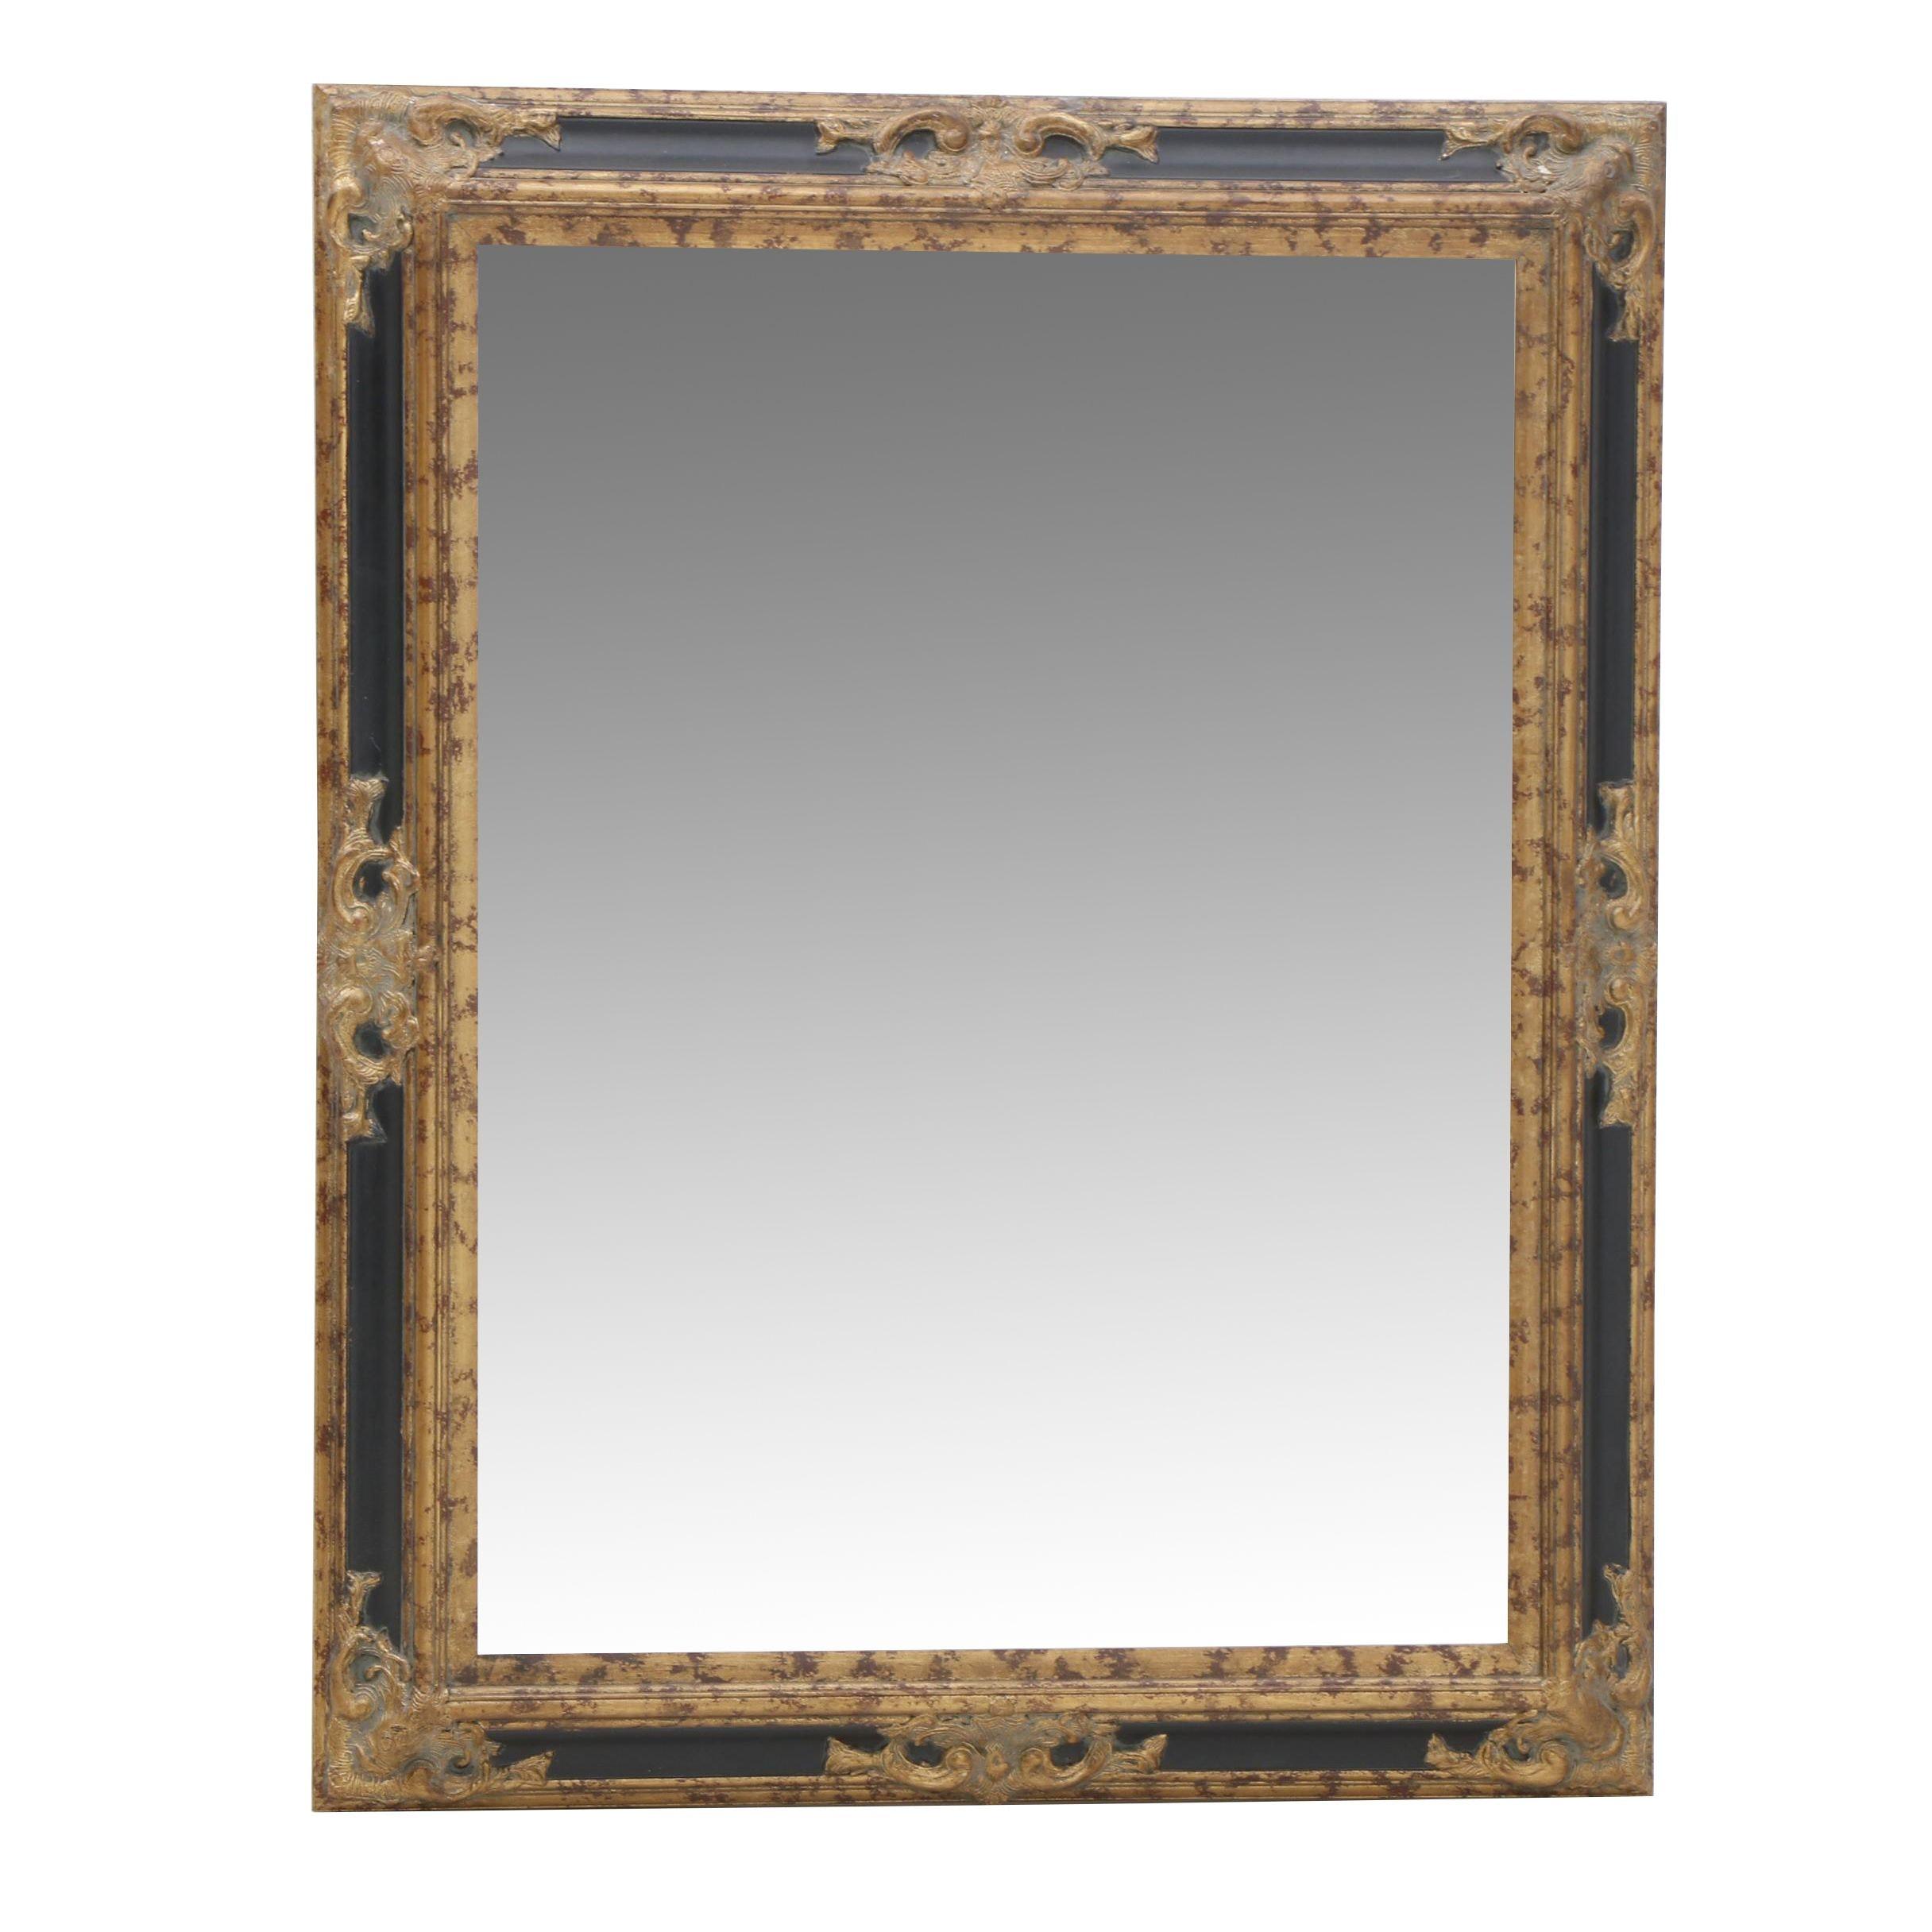 Oversize Decorative Wall Mirror